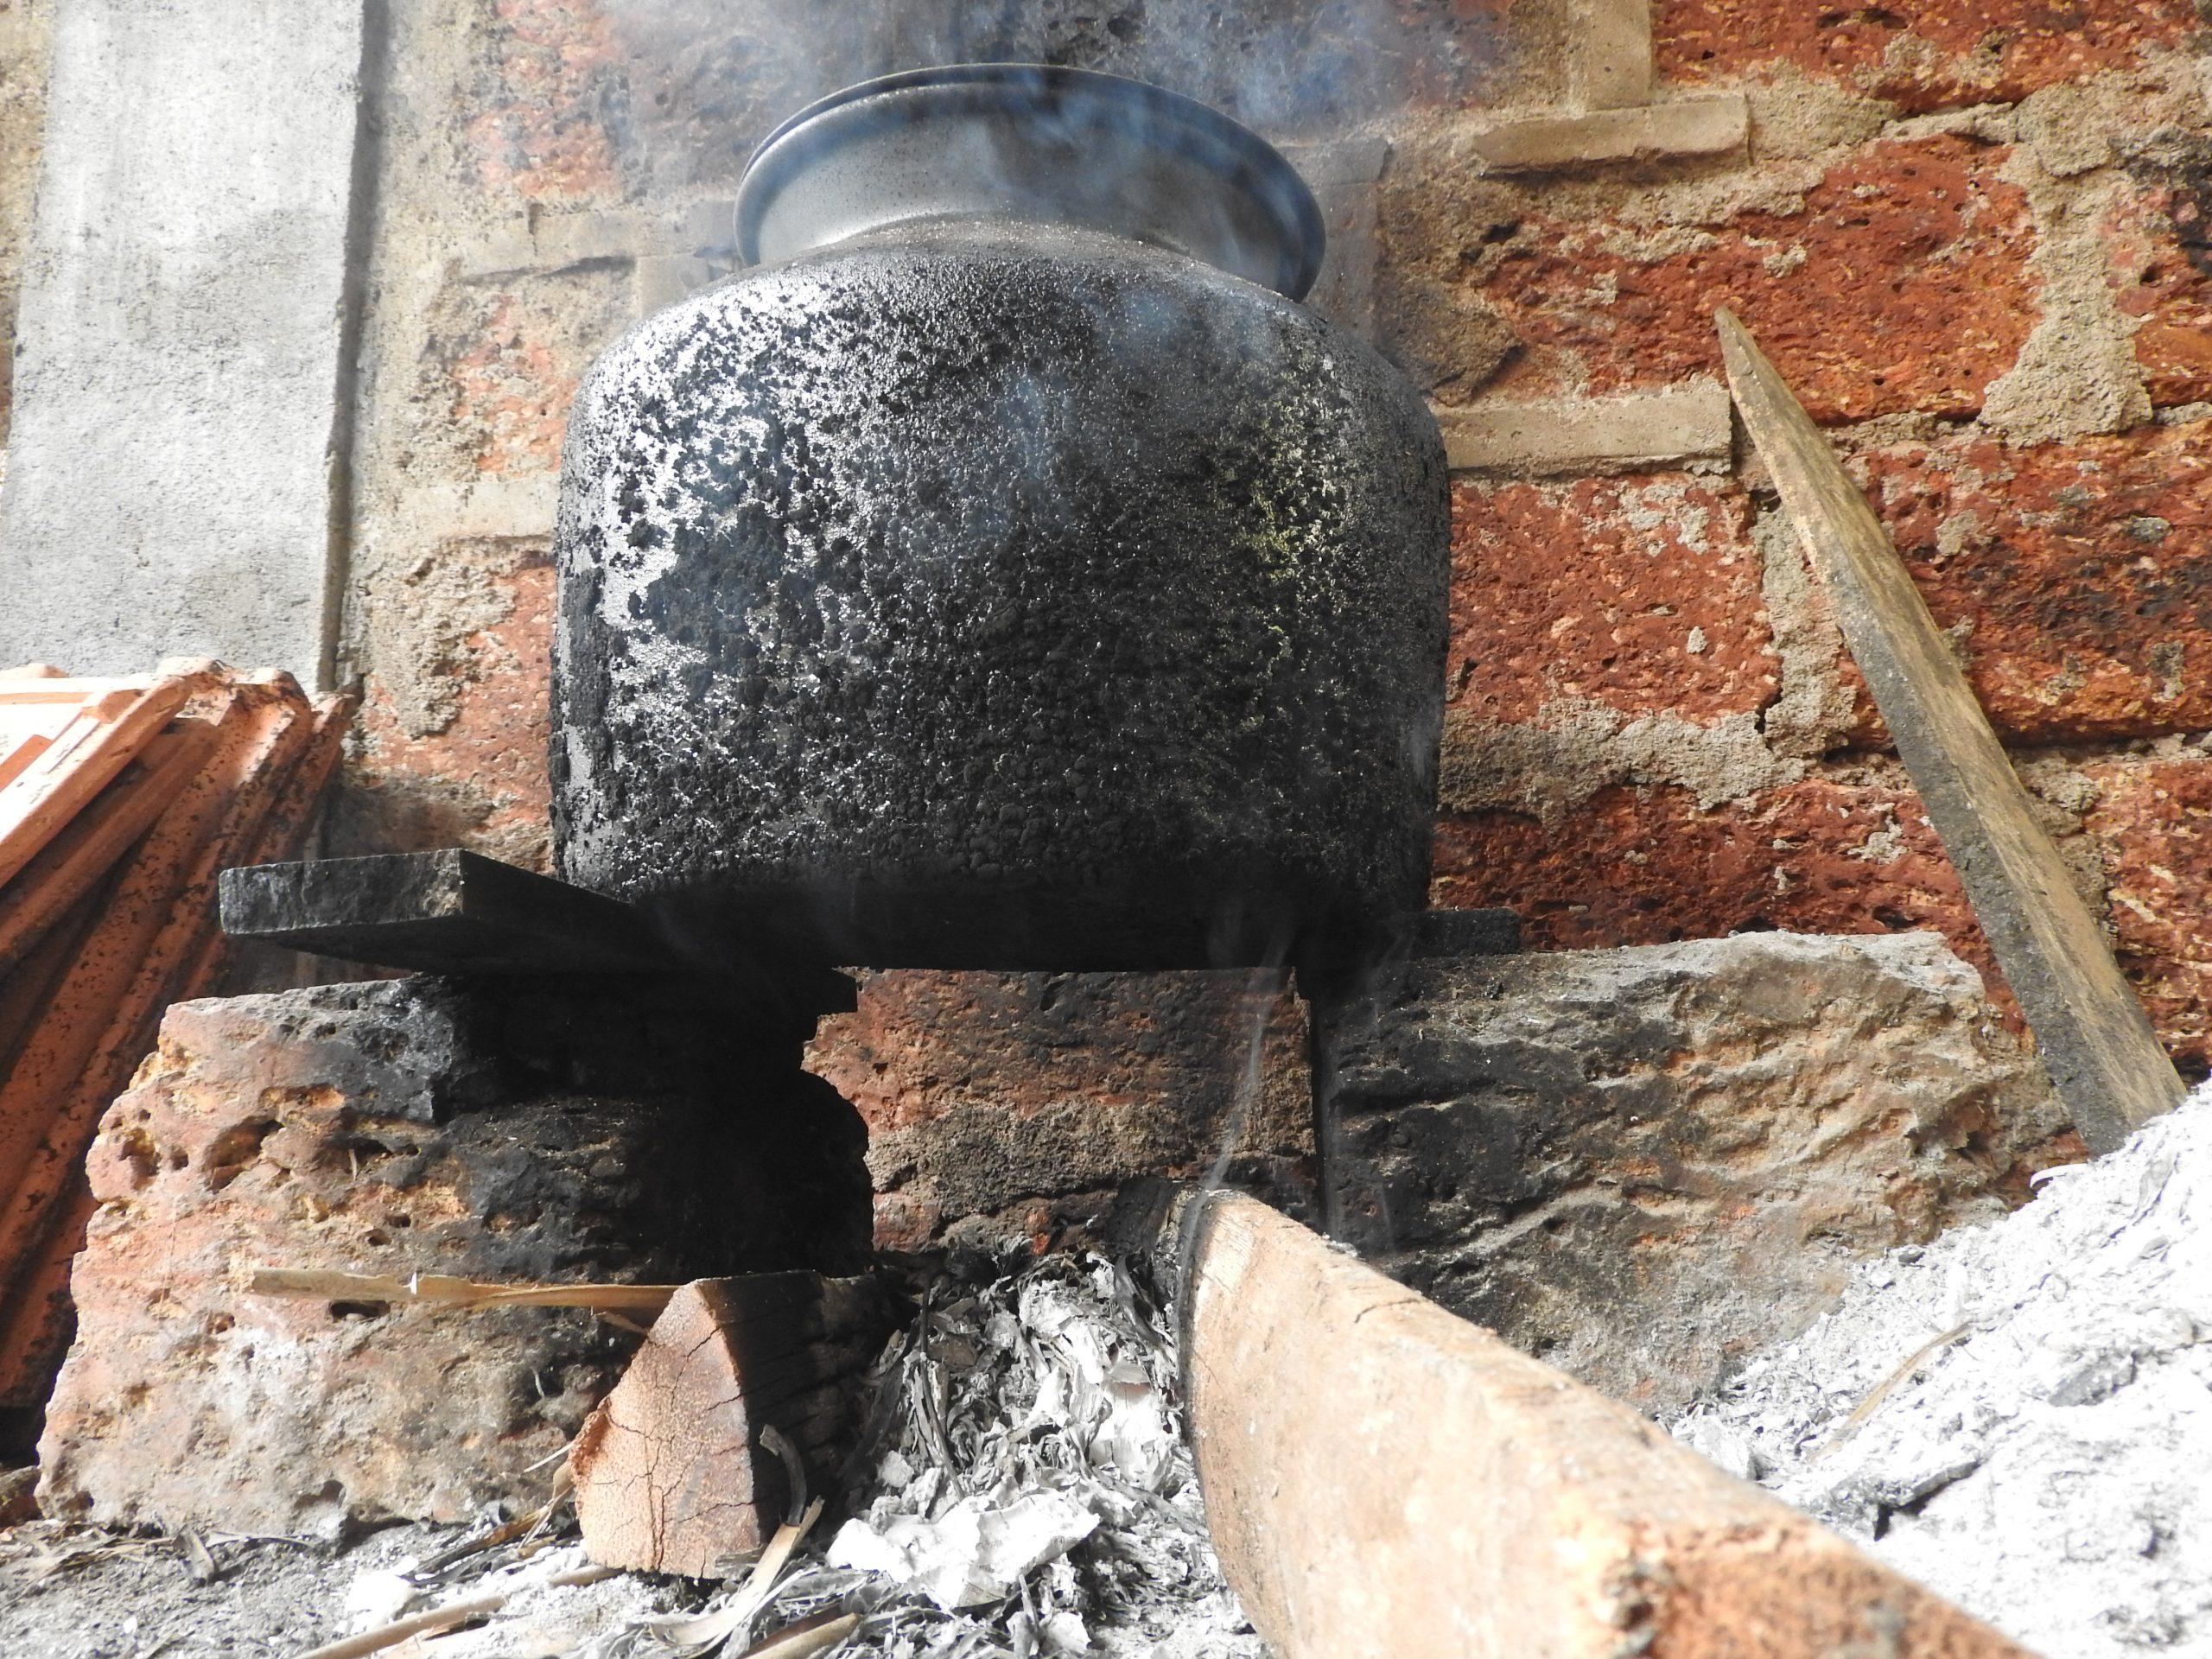 Metal vessel on the fire